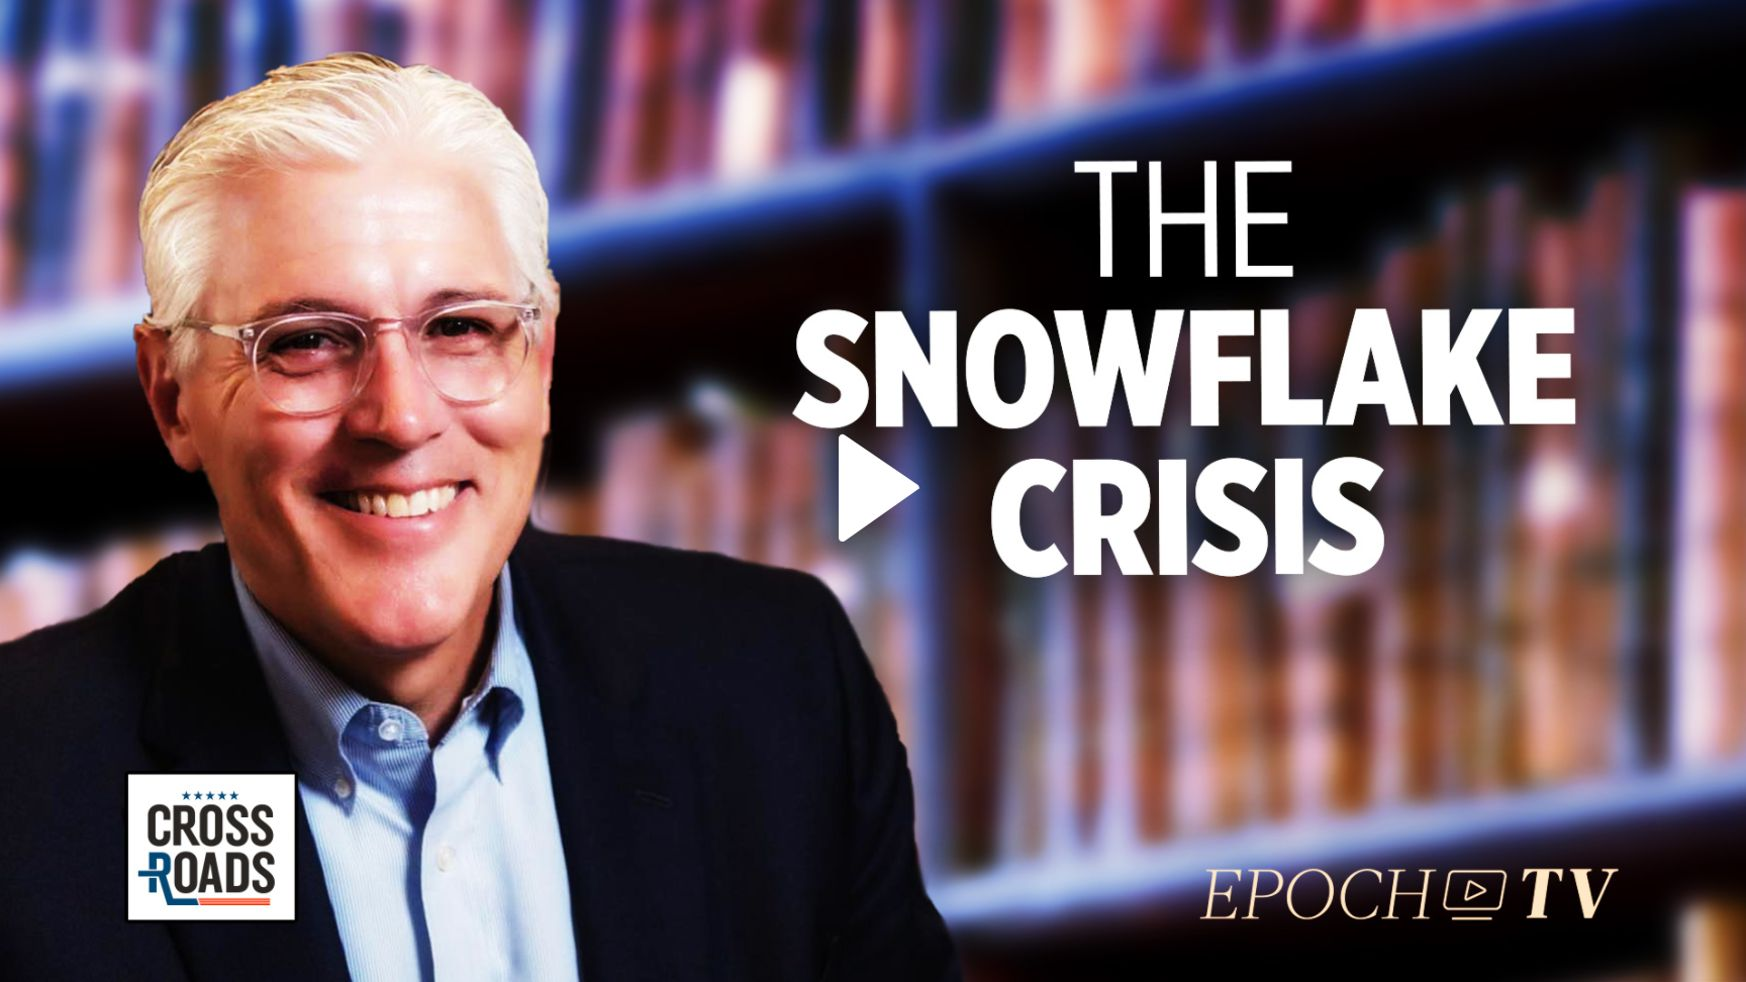 The Snowflake Crisis on Crossroads